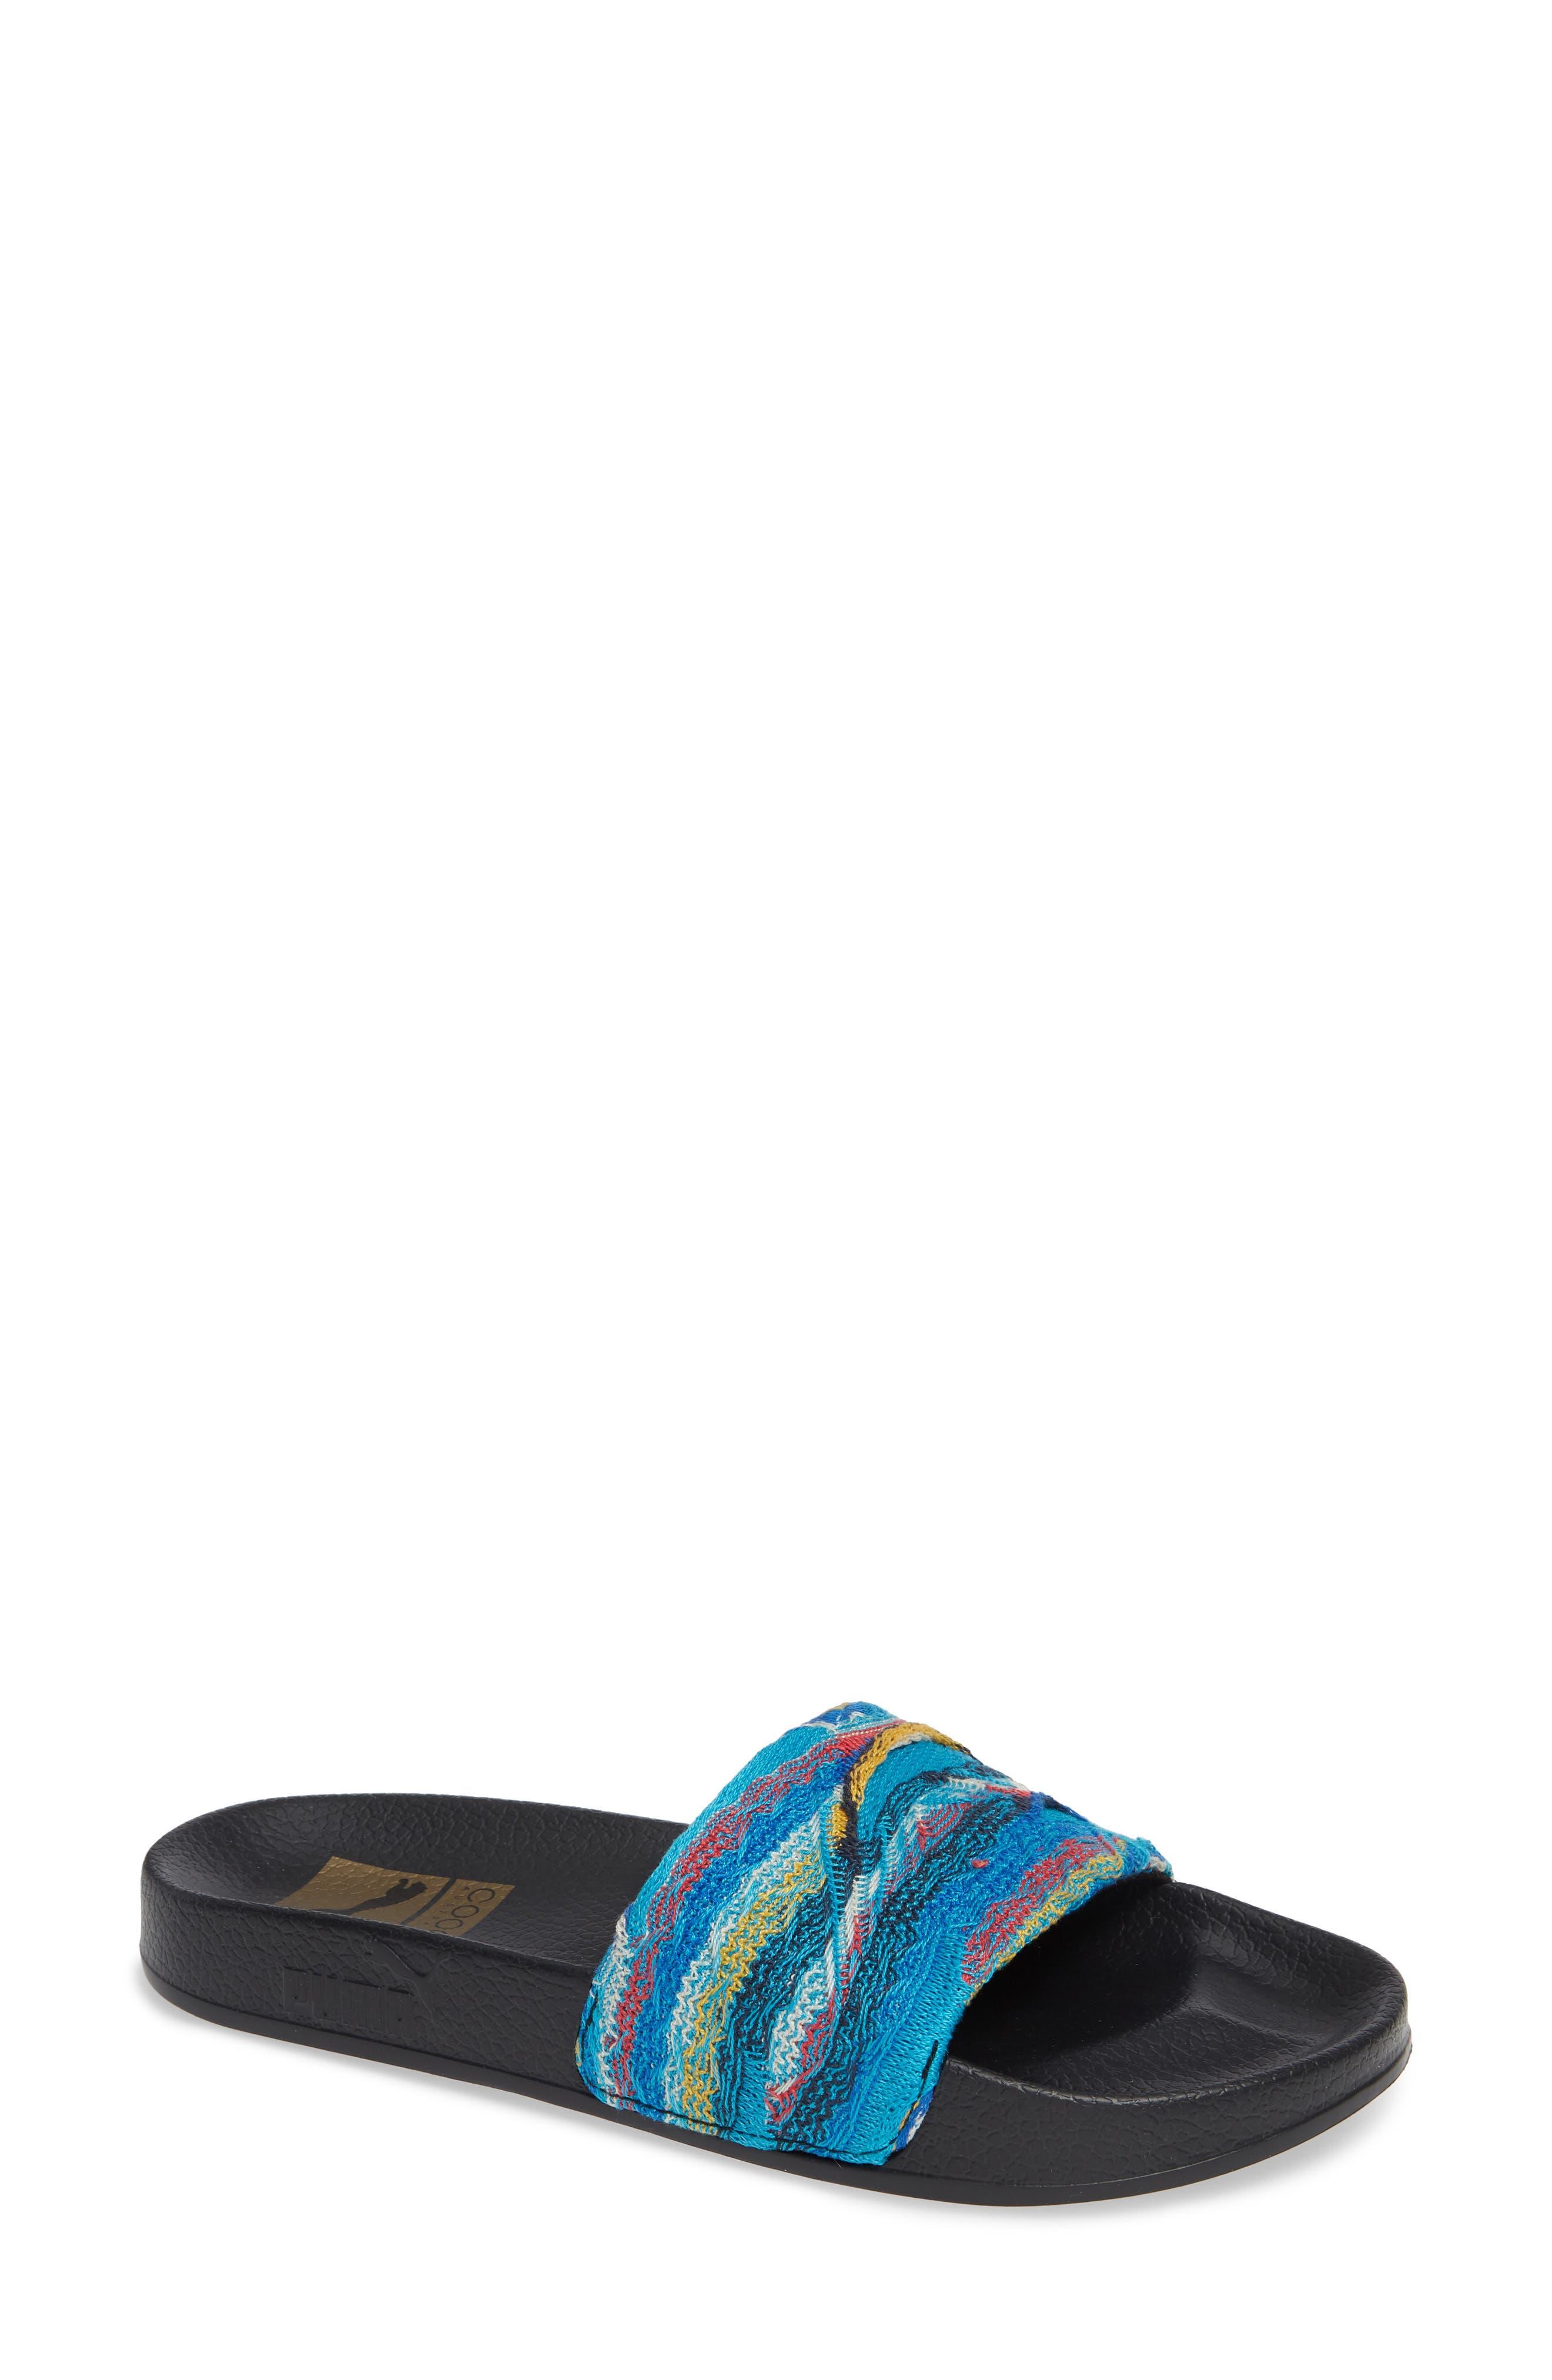 Leadcat Coogie Slide Sandal,                             Main thumbnail 1, color,                             ISLAND PARADISE/ PUMA BLACK